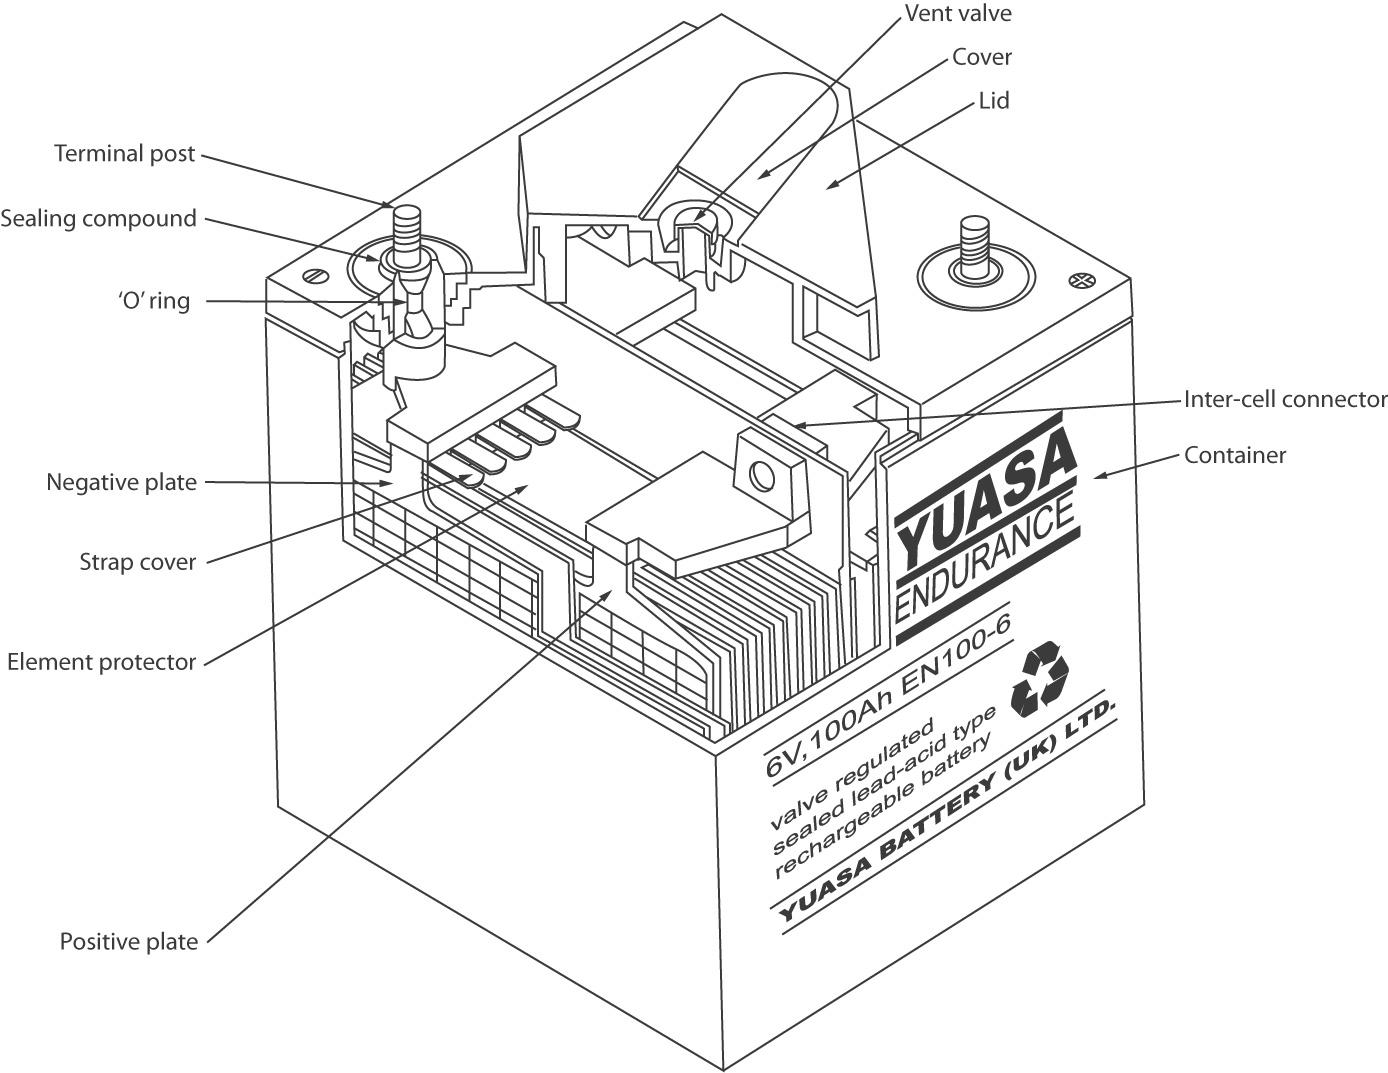 Cross section image of VRLA battery